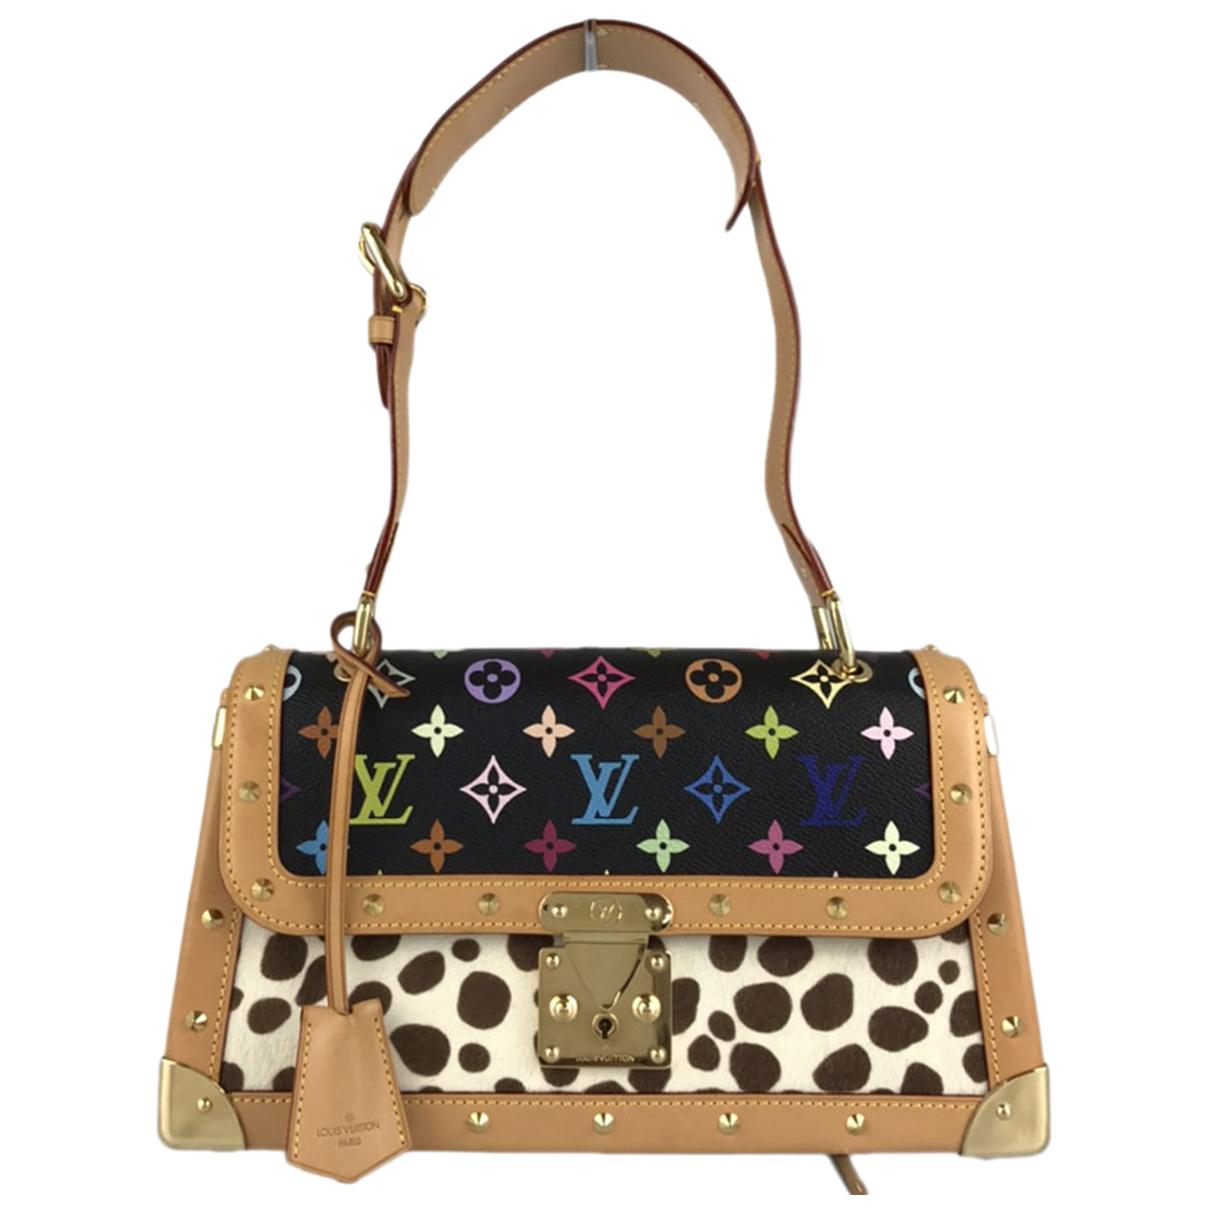 Louis Vuitton Dalmatian  Multicolour Pony-style calfskin handbag for Women N